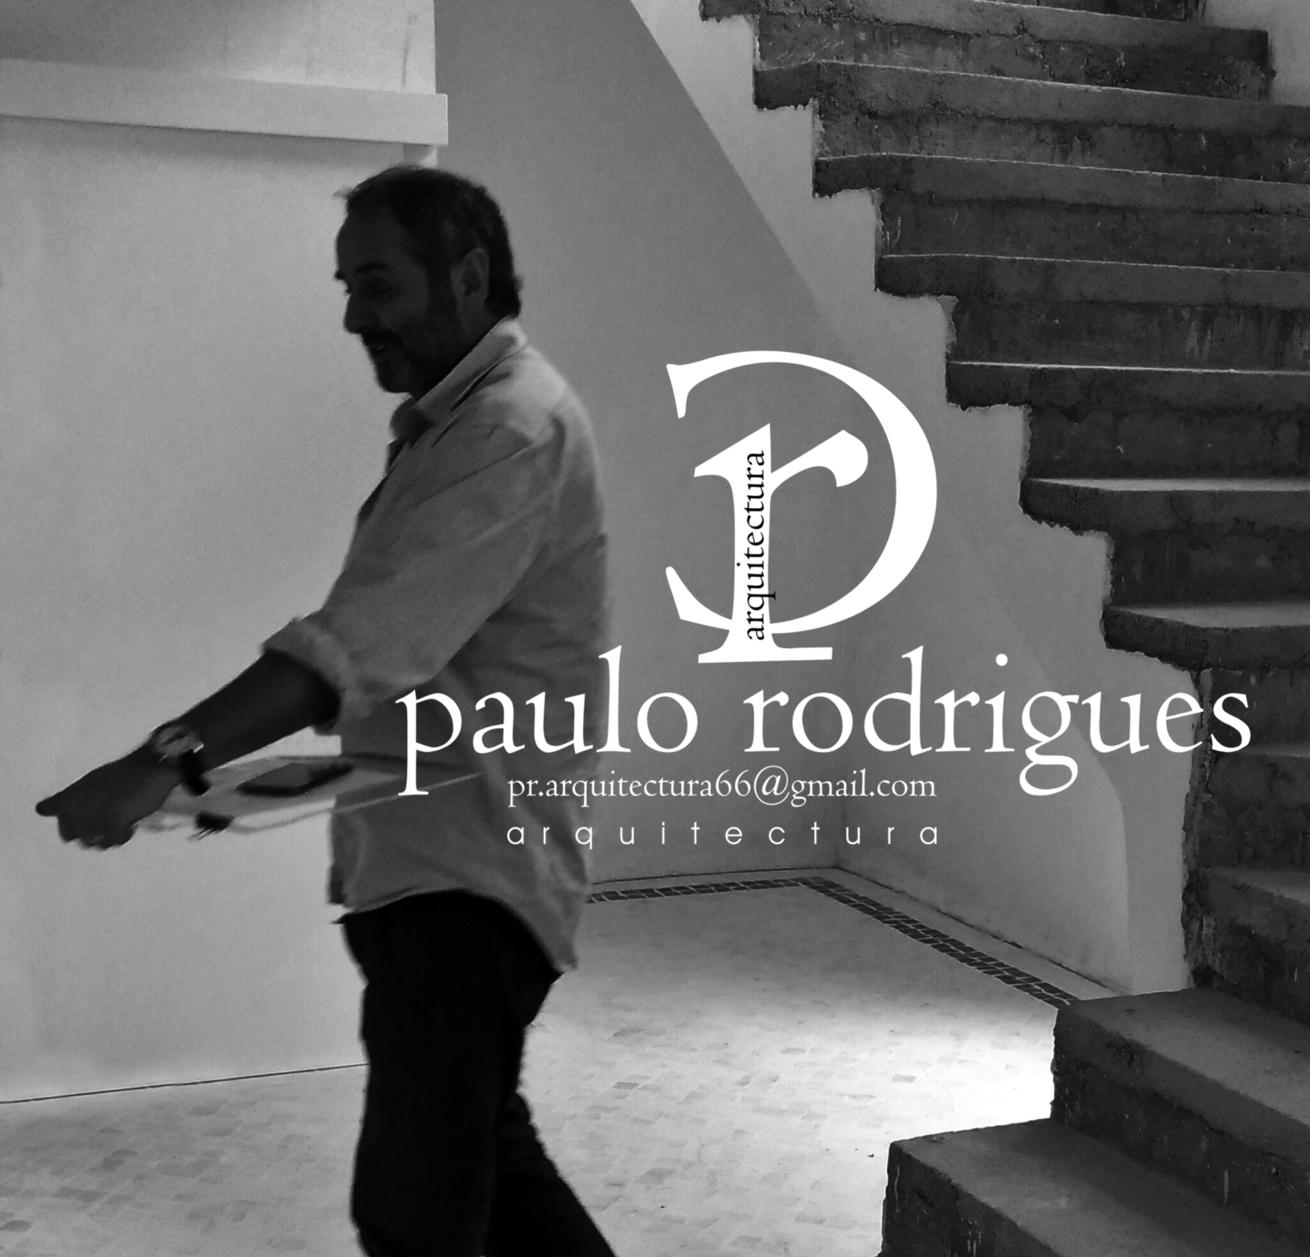 Paulo Rodrigues - Arquitetura, Lda. Avatar